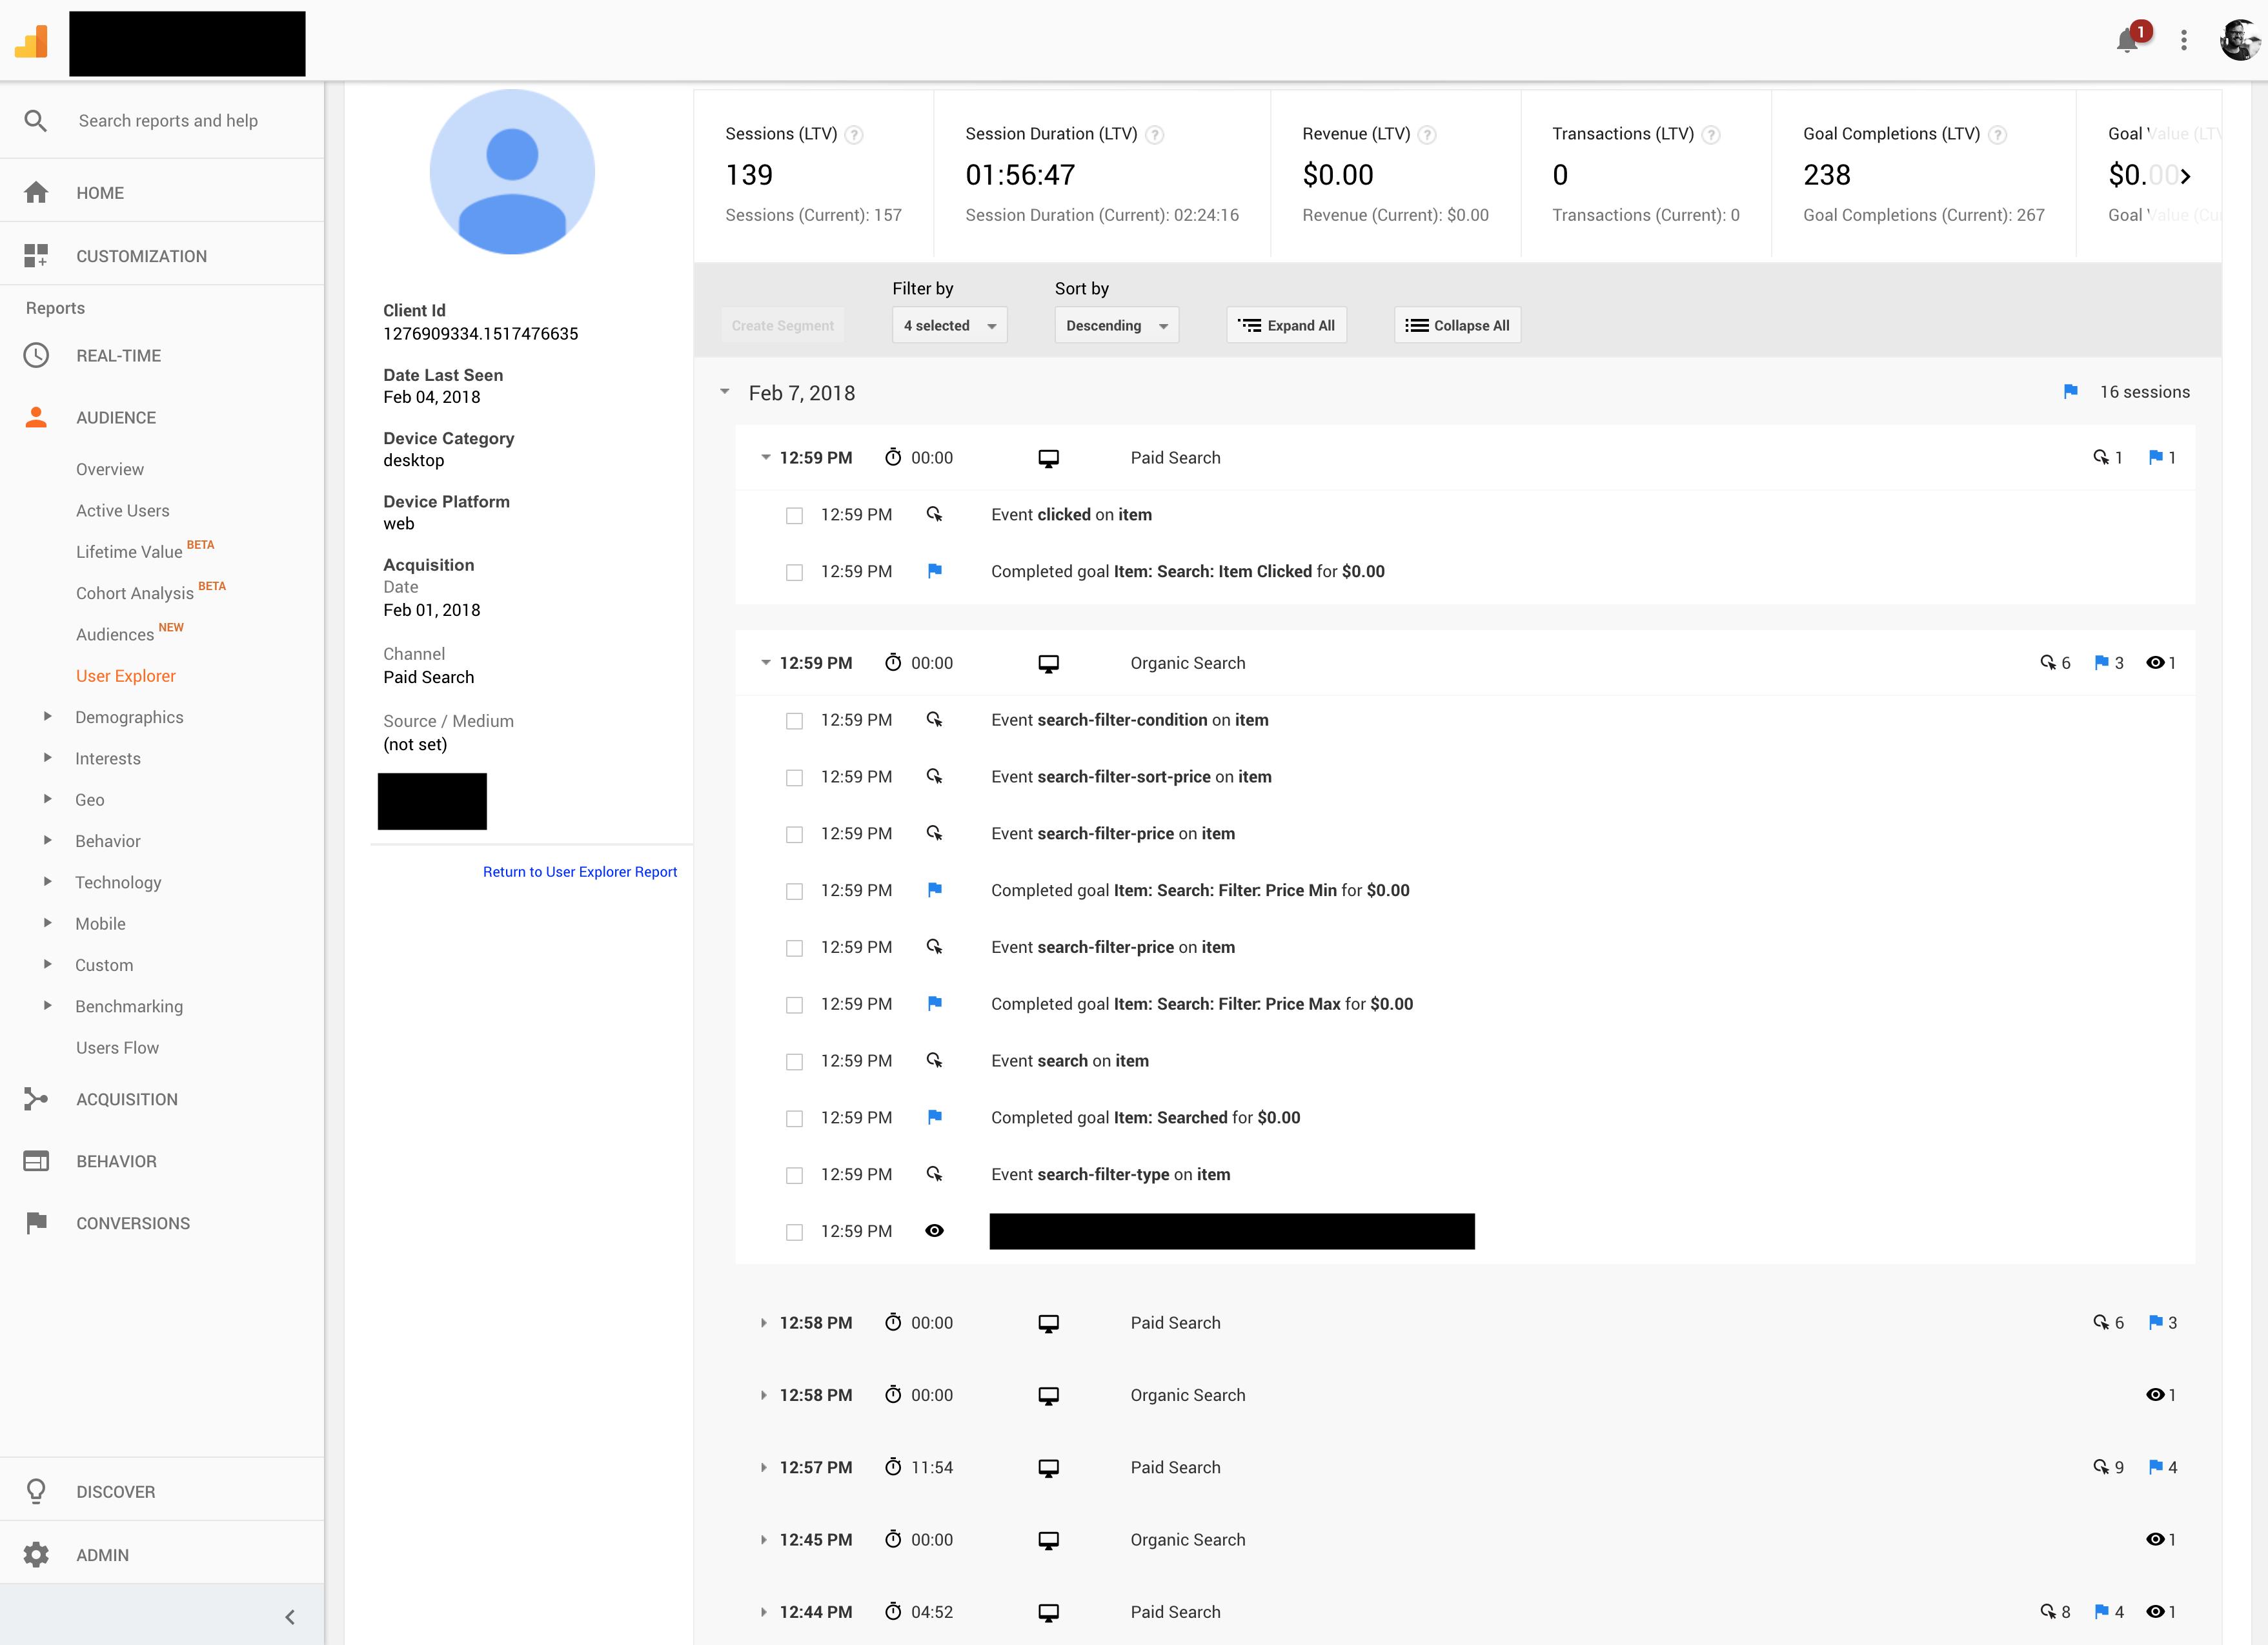 screenshot 2018-02-08 14 46 57